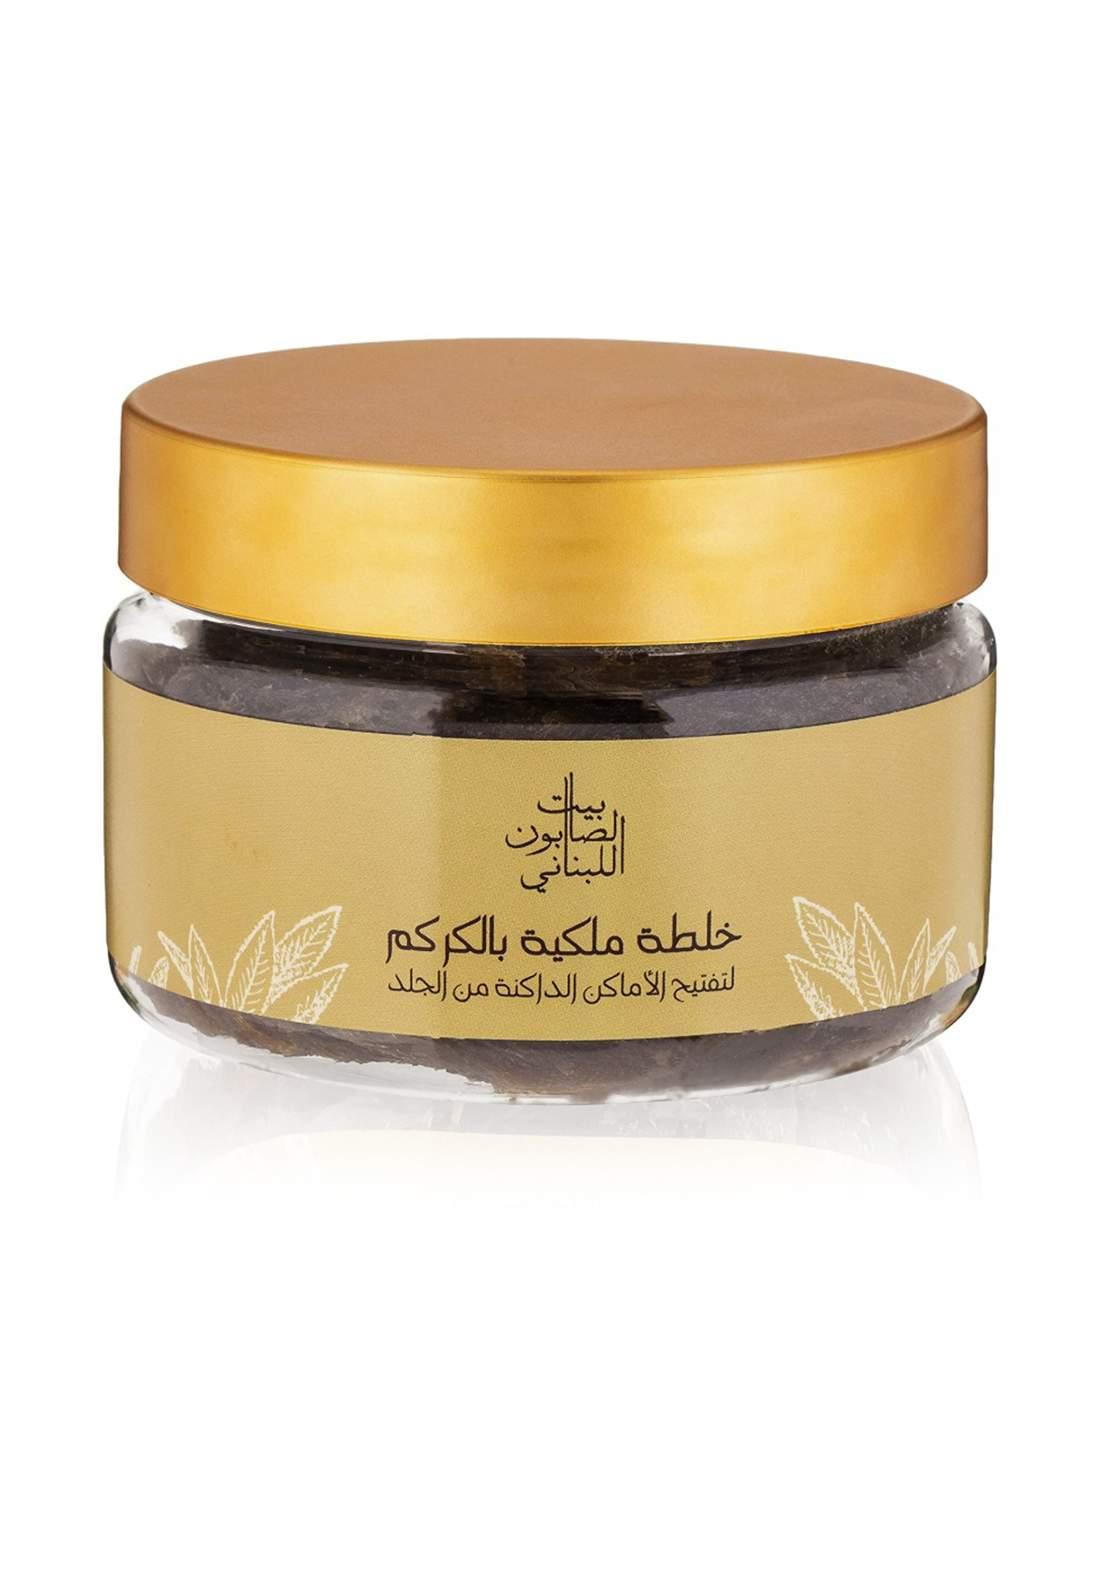 Bayt Alsaboun Alloubnani-317447 Curcum  Royal Formula 300g كريم